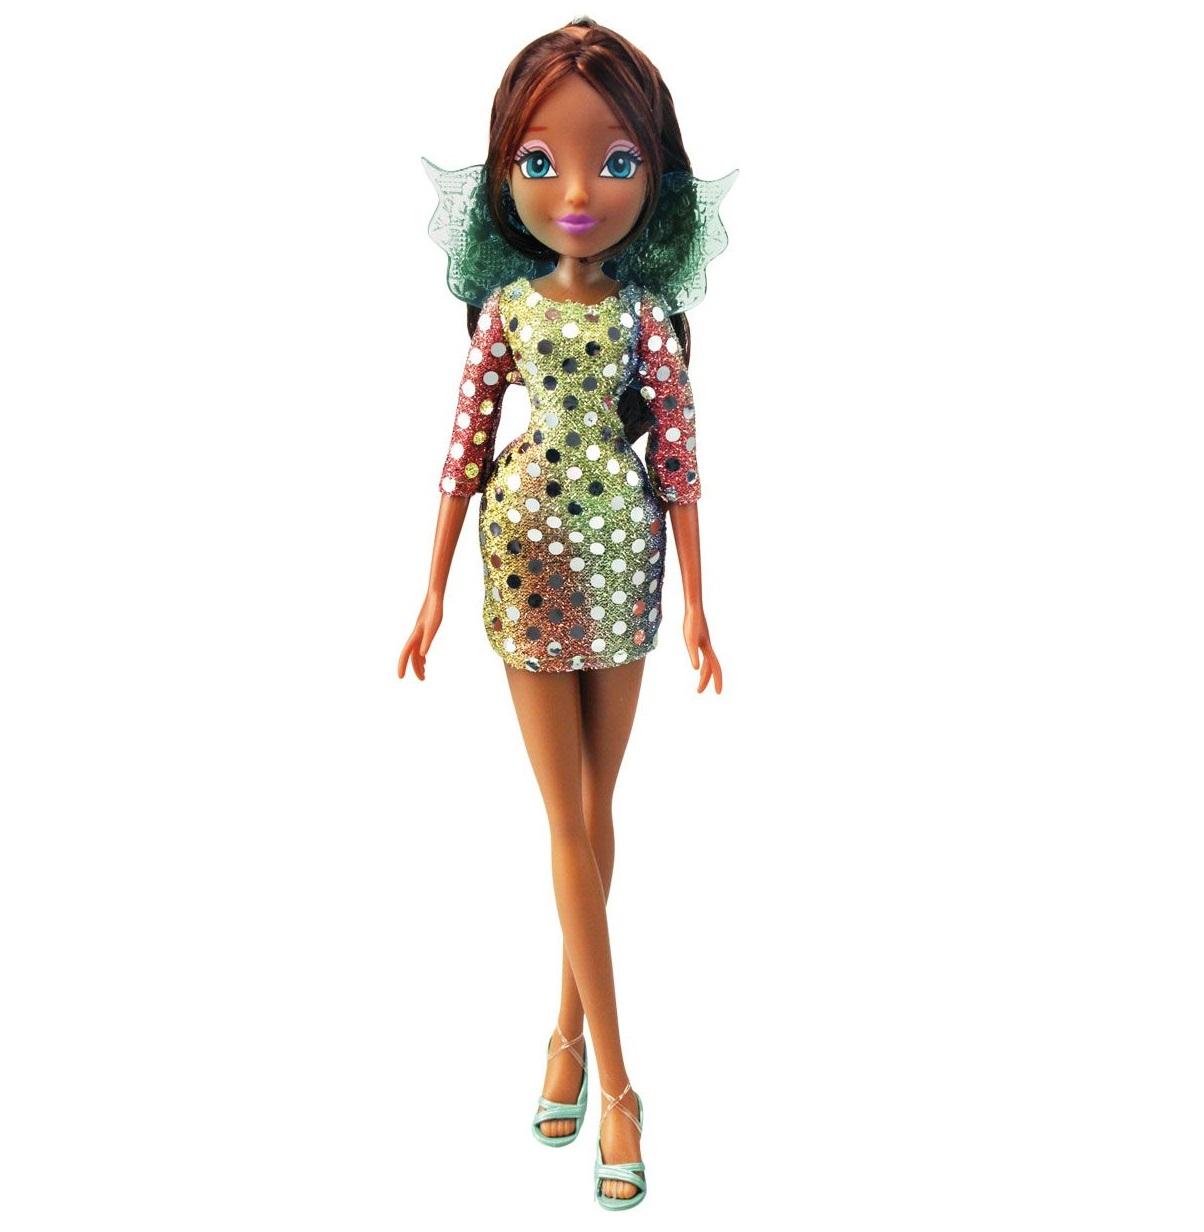 Кукла из серии Winx Club - Диско LaylaКуклы Винкс (Winx)<br>Кукла из серии Winx Club - Диско Layla<br>